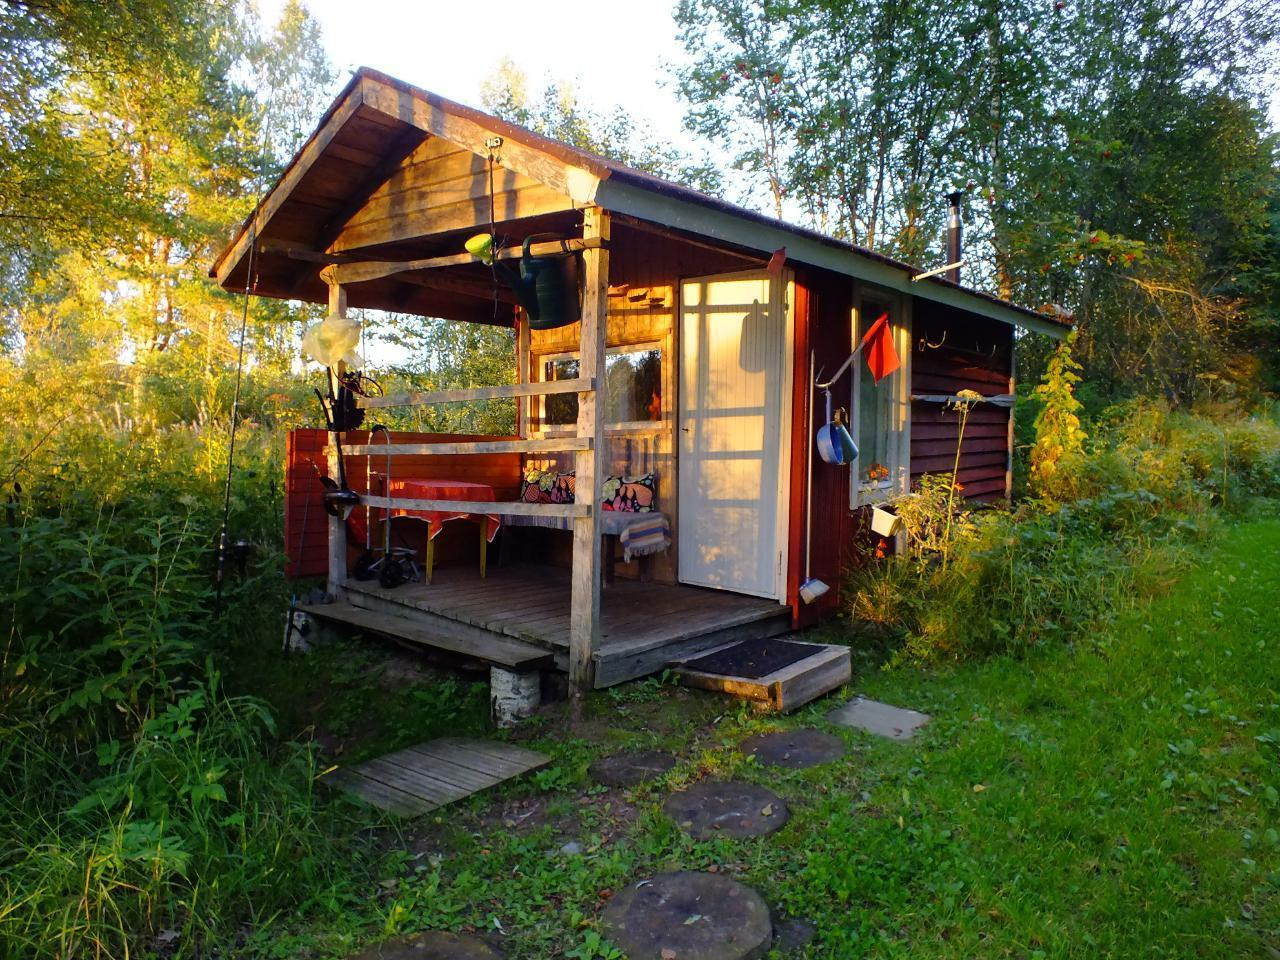 Ferienhaus - Mökki mit Sauna direkt am See  in Mouhijärvi-Sastamala (1707905), Mouhijärvi, , Westfinnland, Finnland, Bild 16